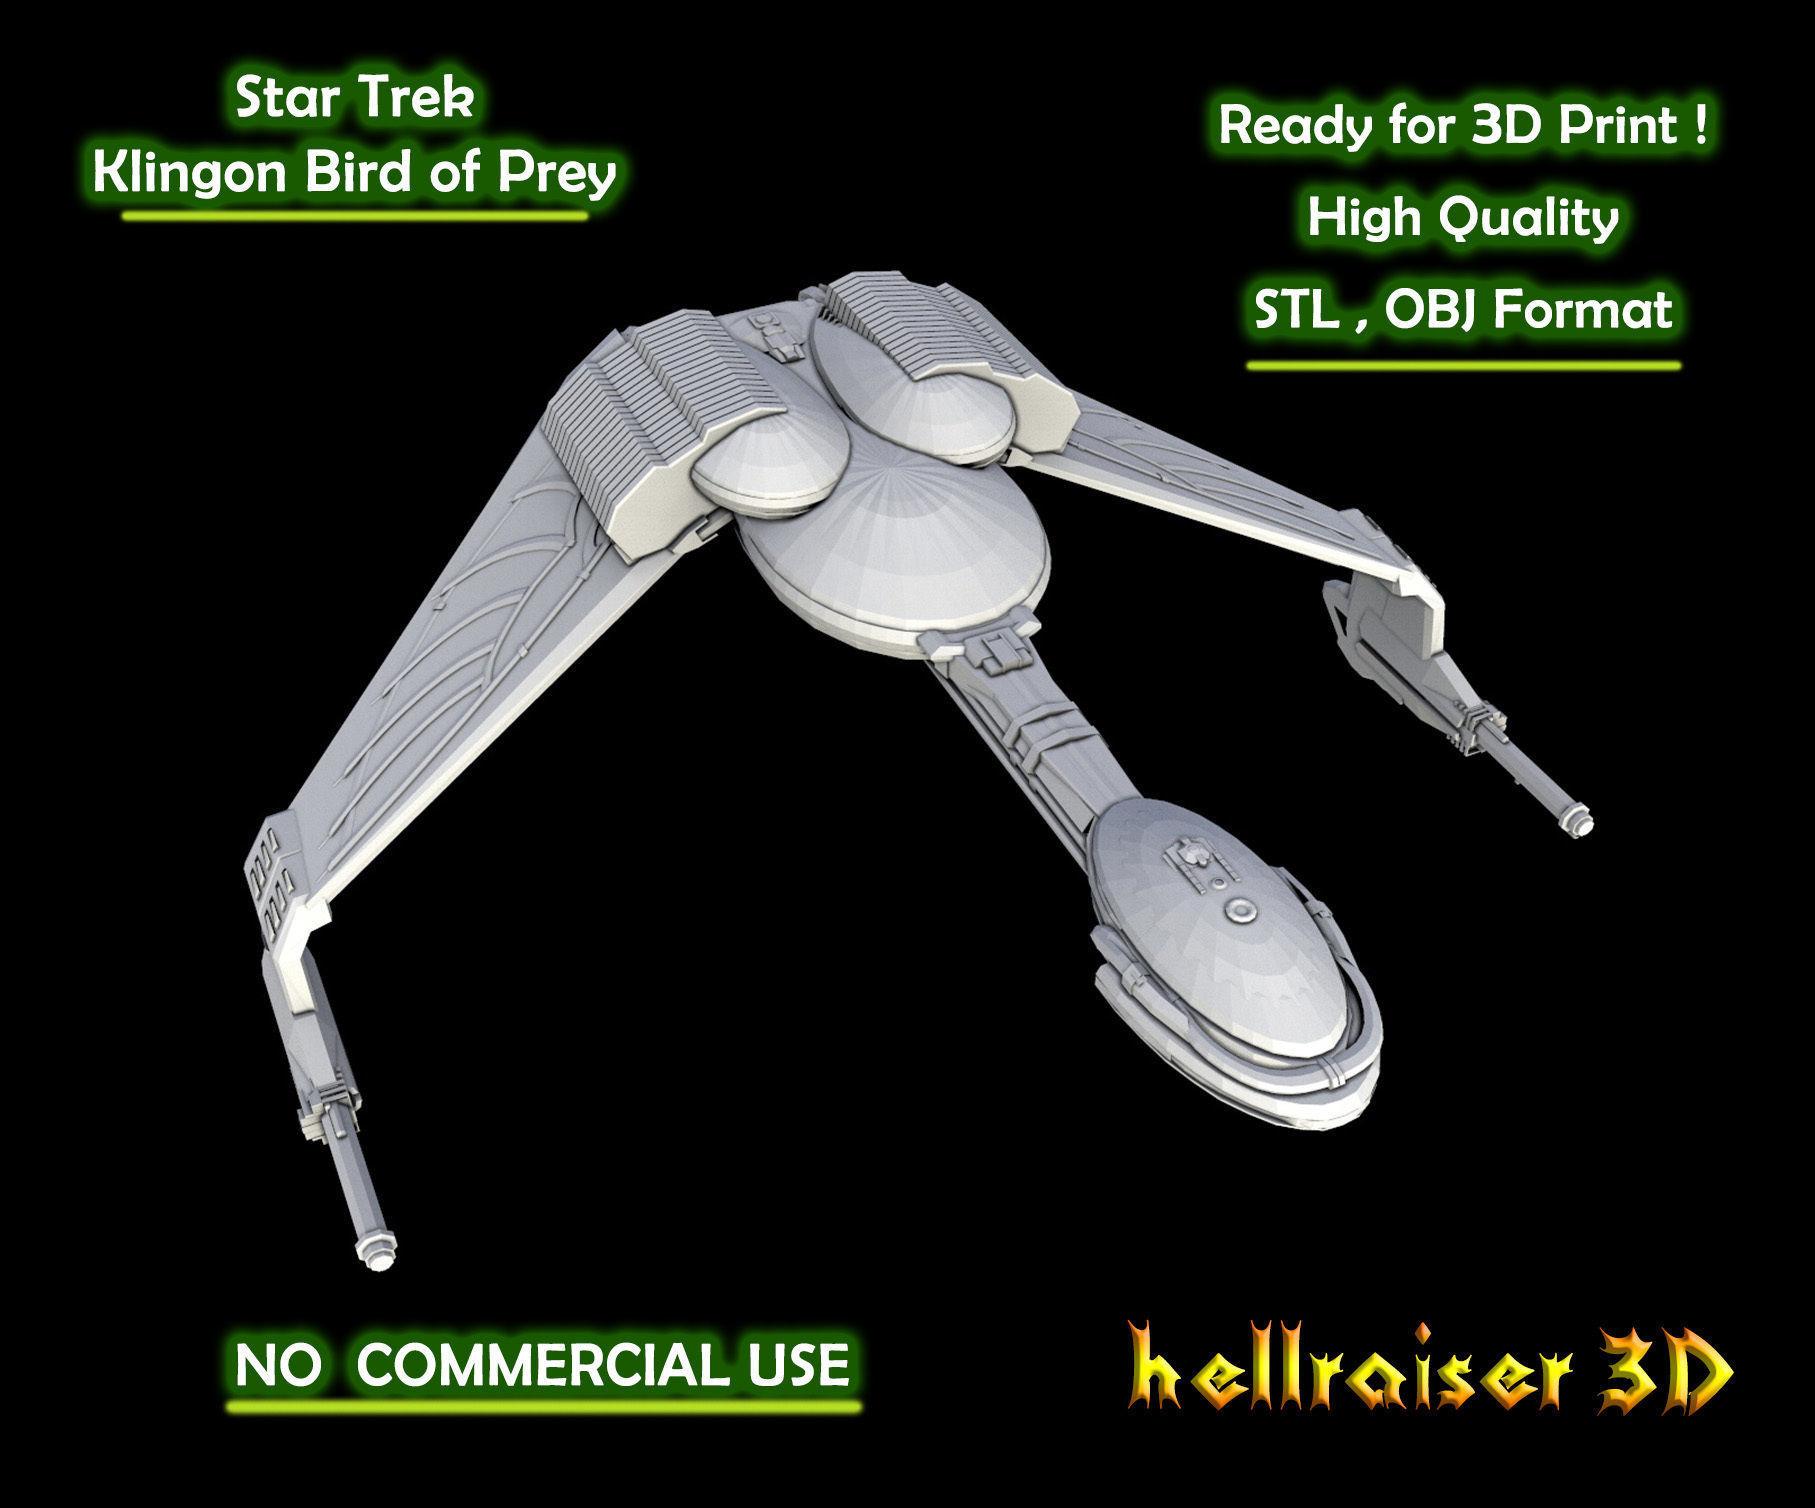 Star Trek - Klingon Bird of Prey - 3D Printable Model